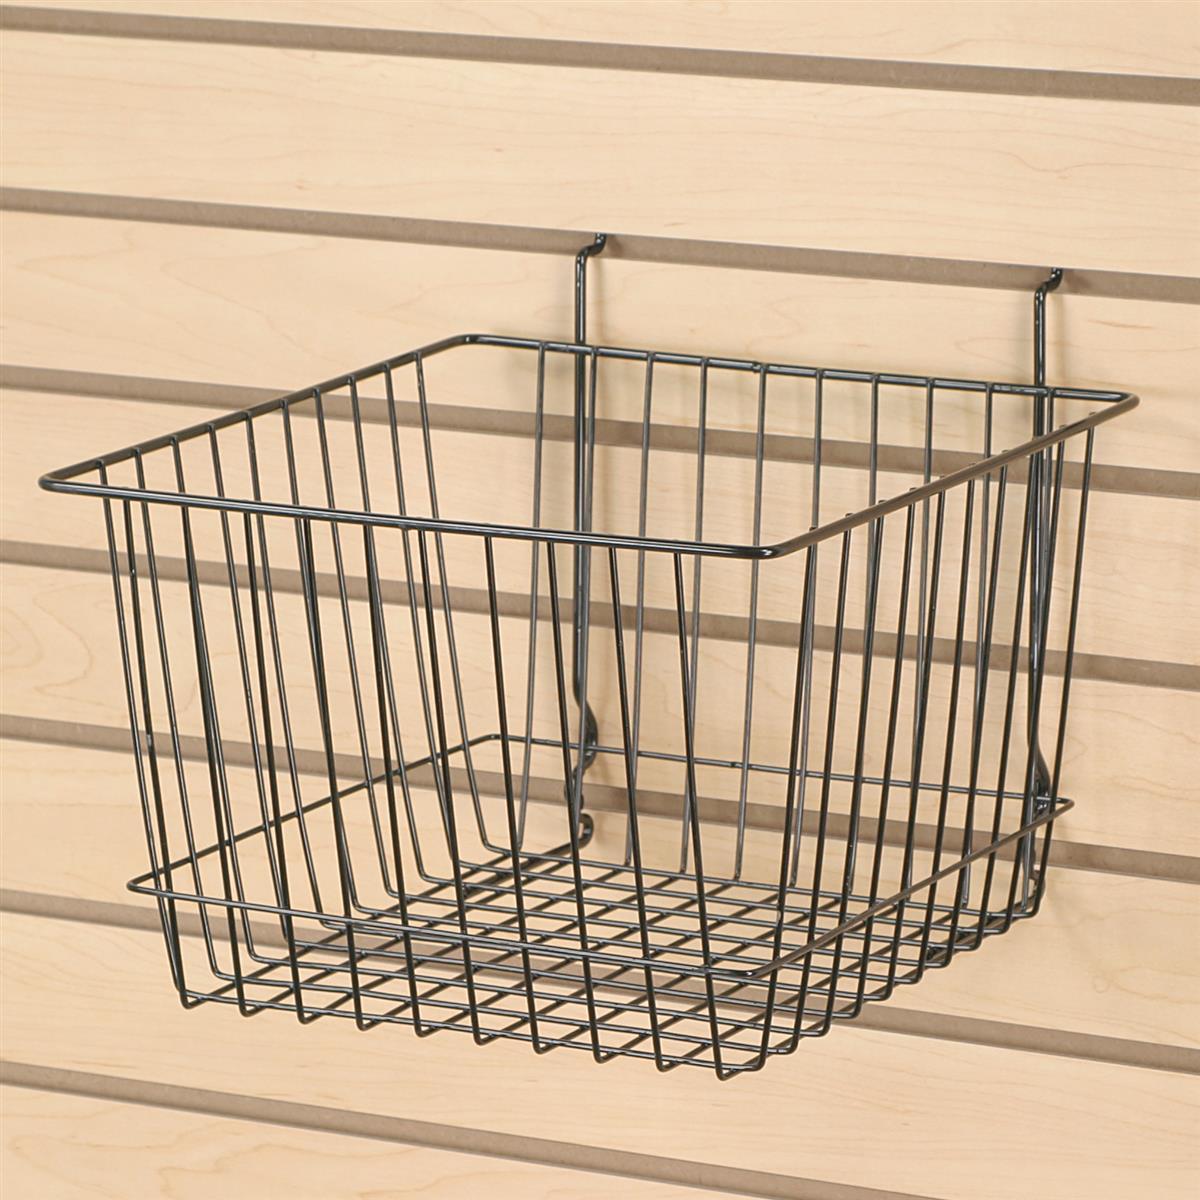 slatwall gridwall wire basket hanging merchandising bin. Black Bedroom Furniture Sets. Home Design Ideas